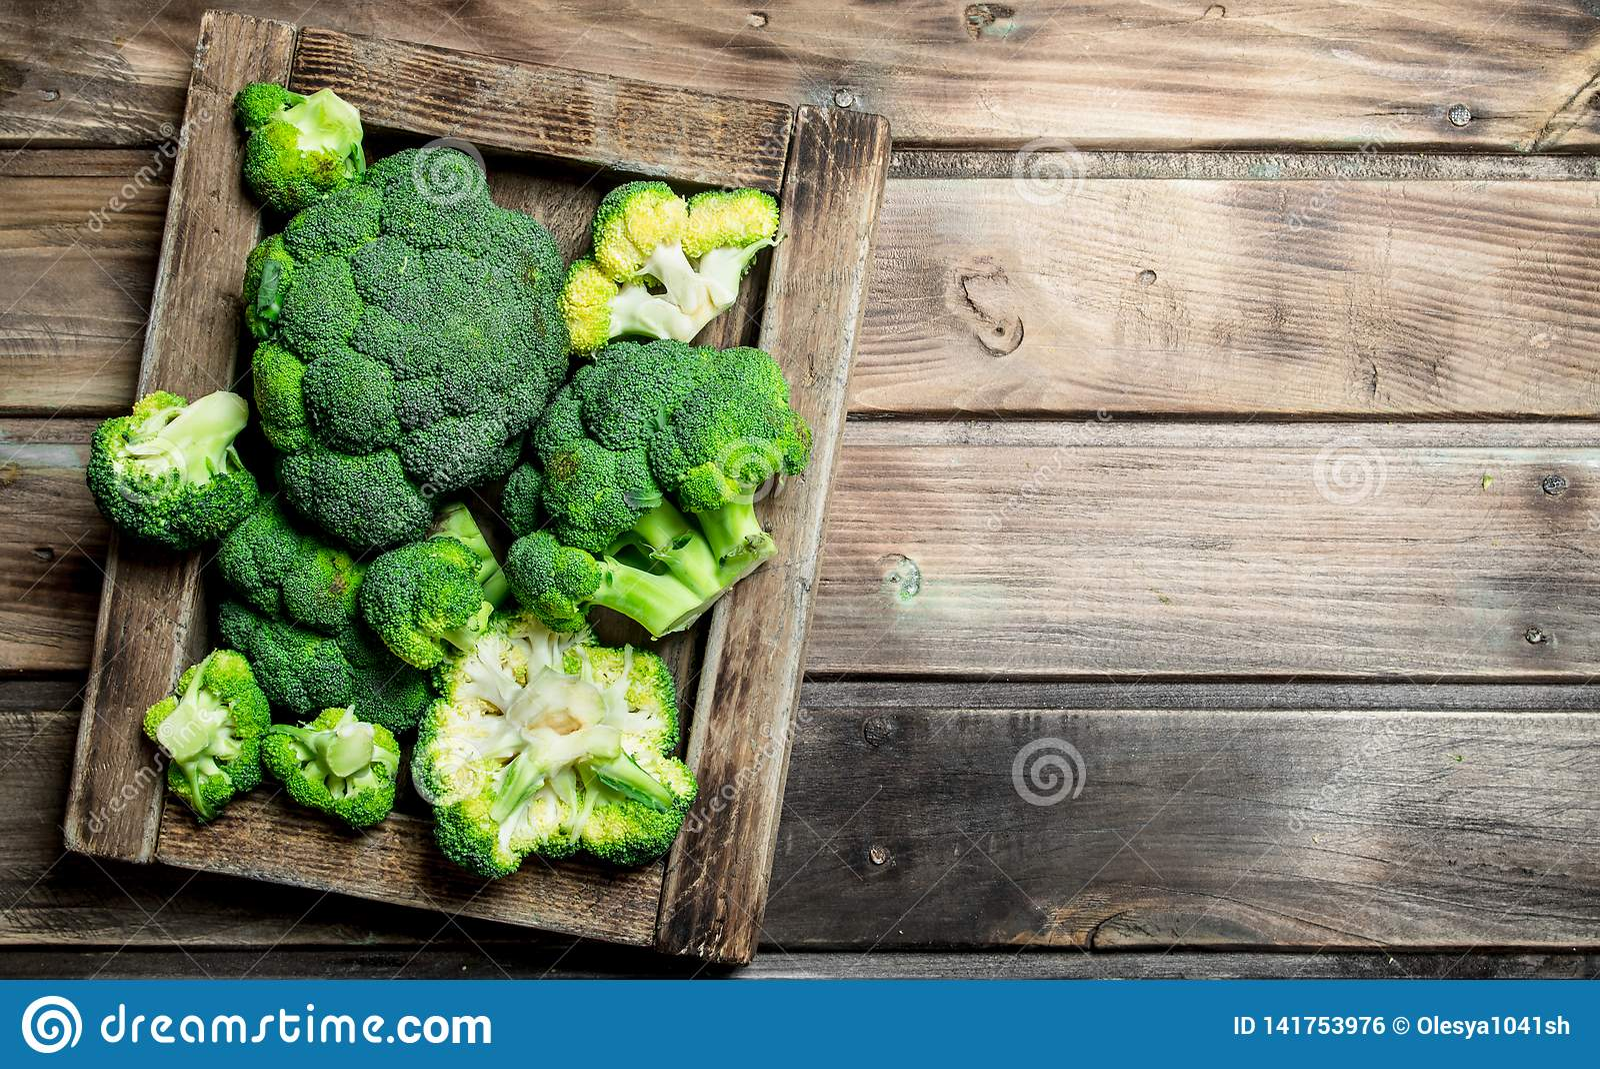 Fresh broccoli in a wooden box